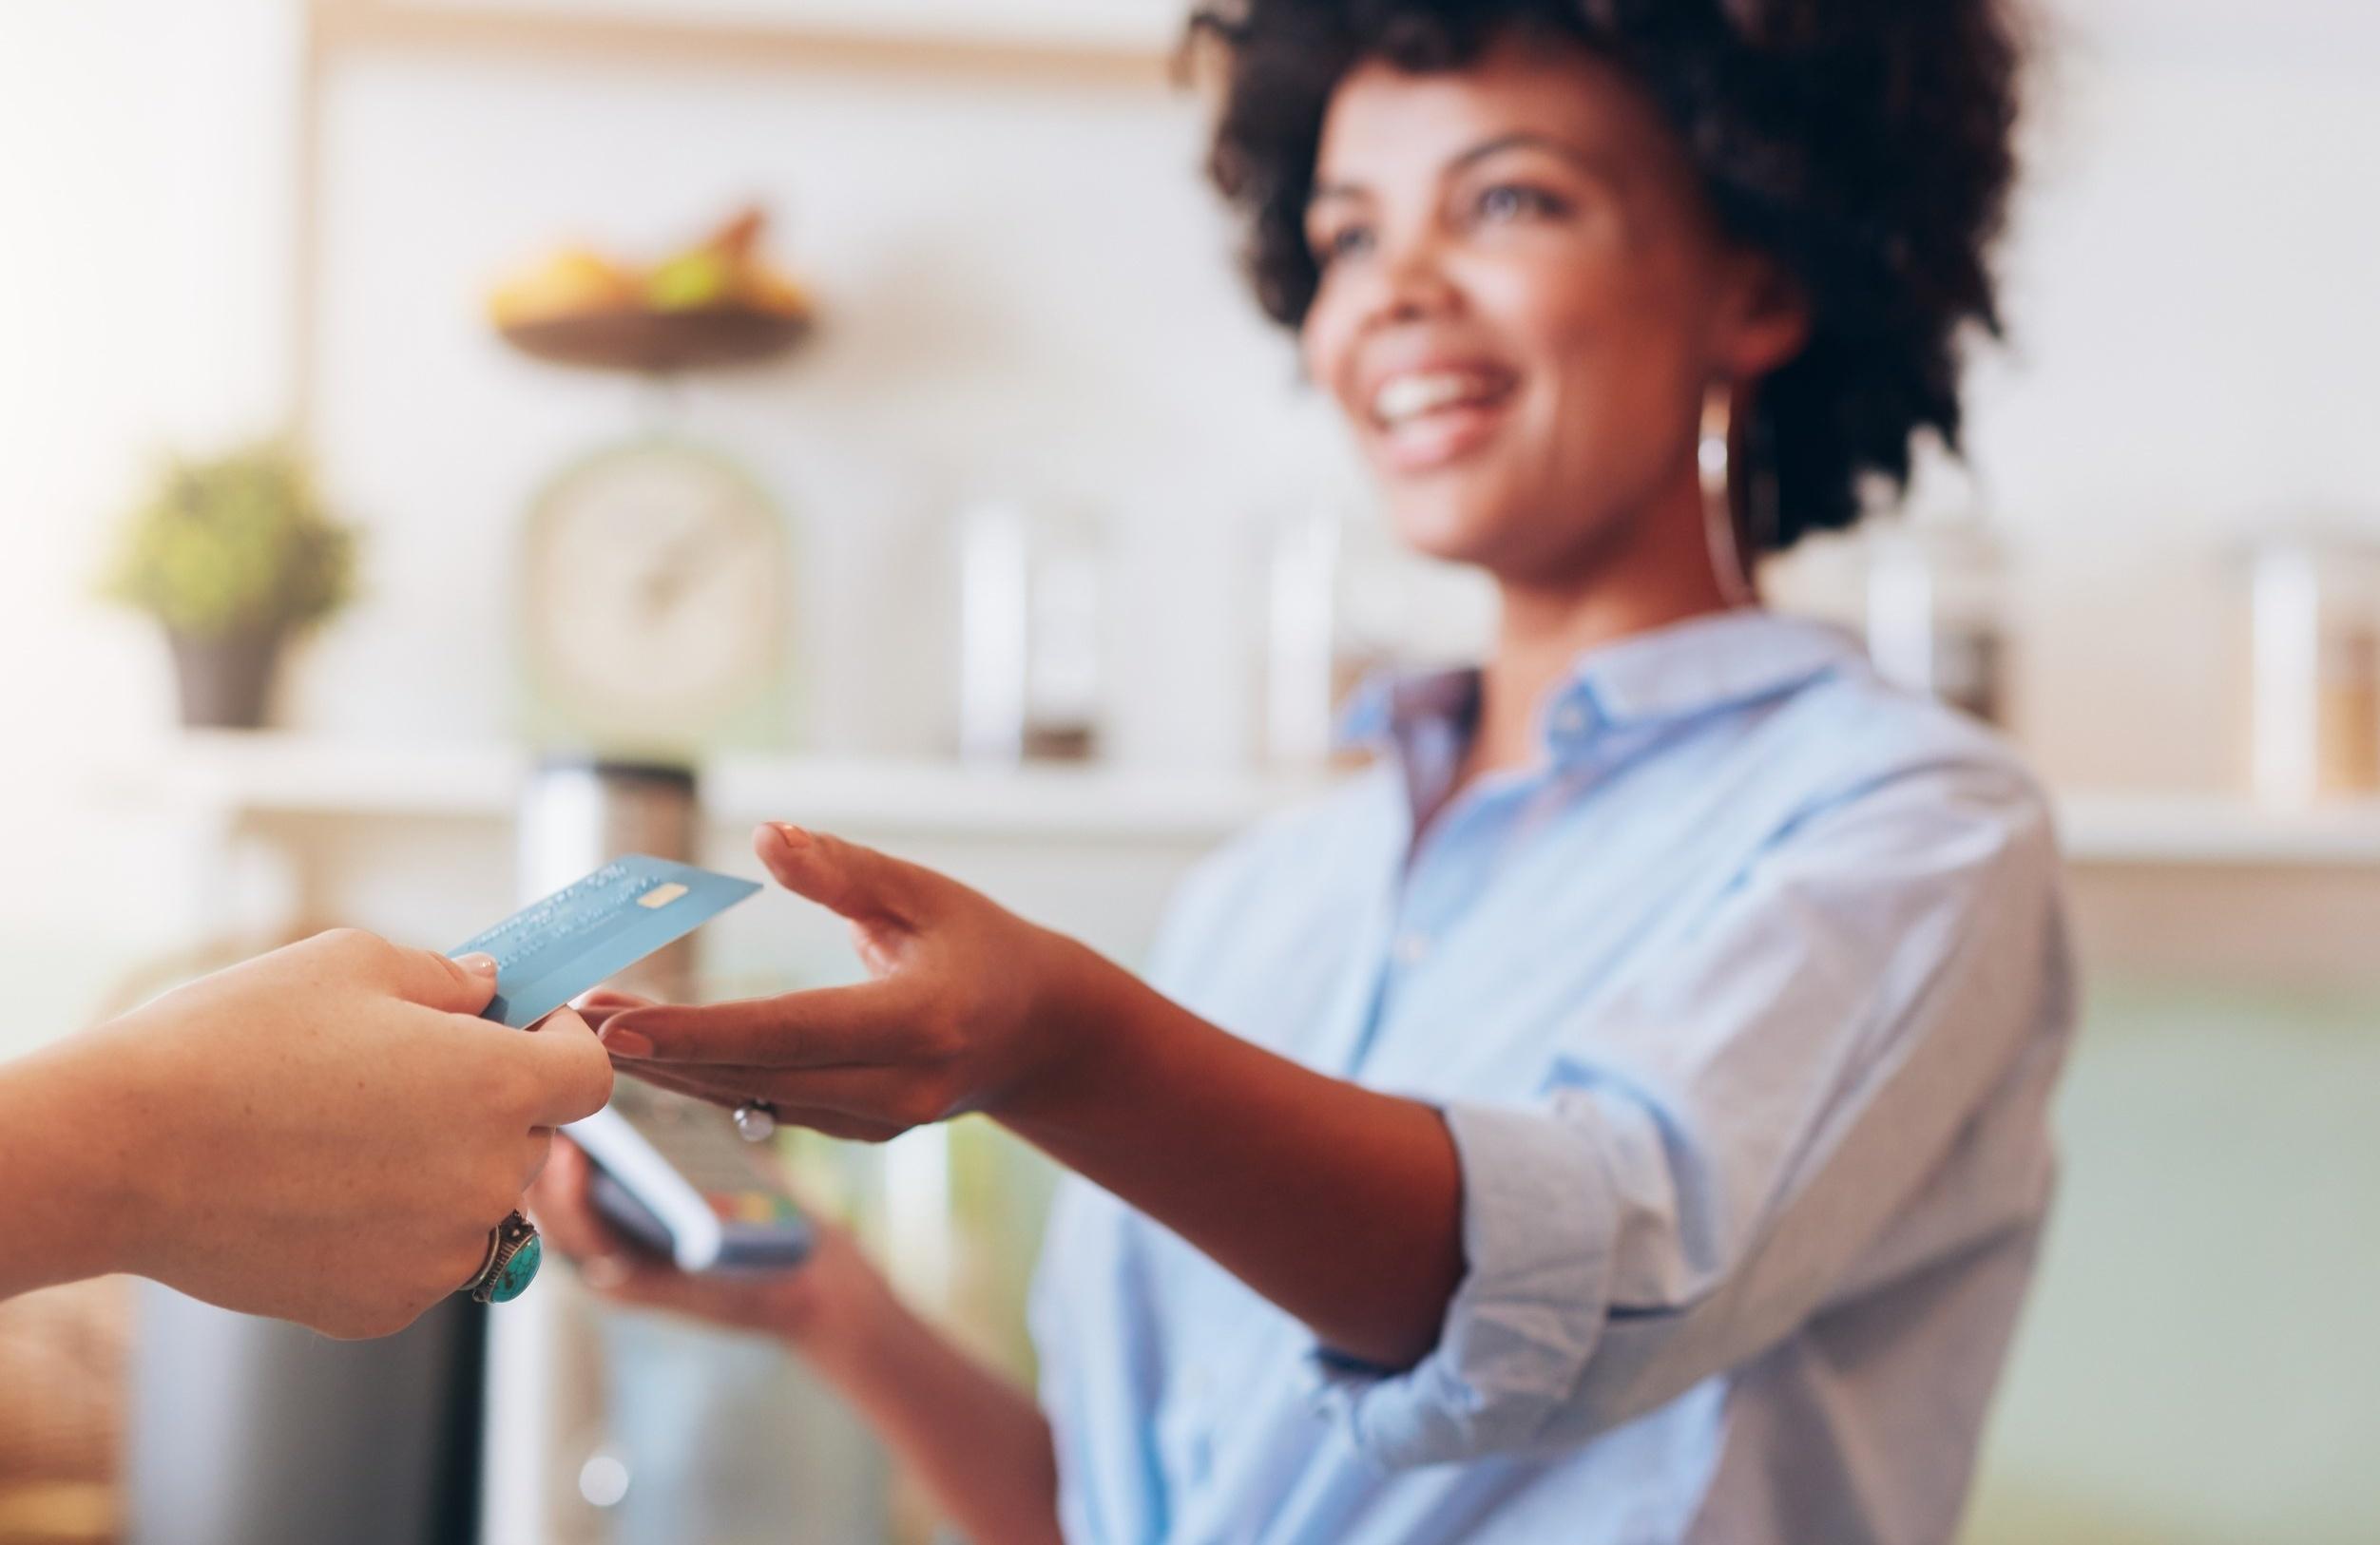 Retail and IoT, Part II: Generating Warehouse Efficiencies